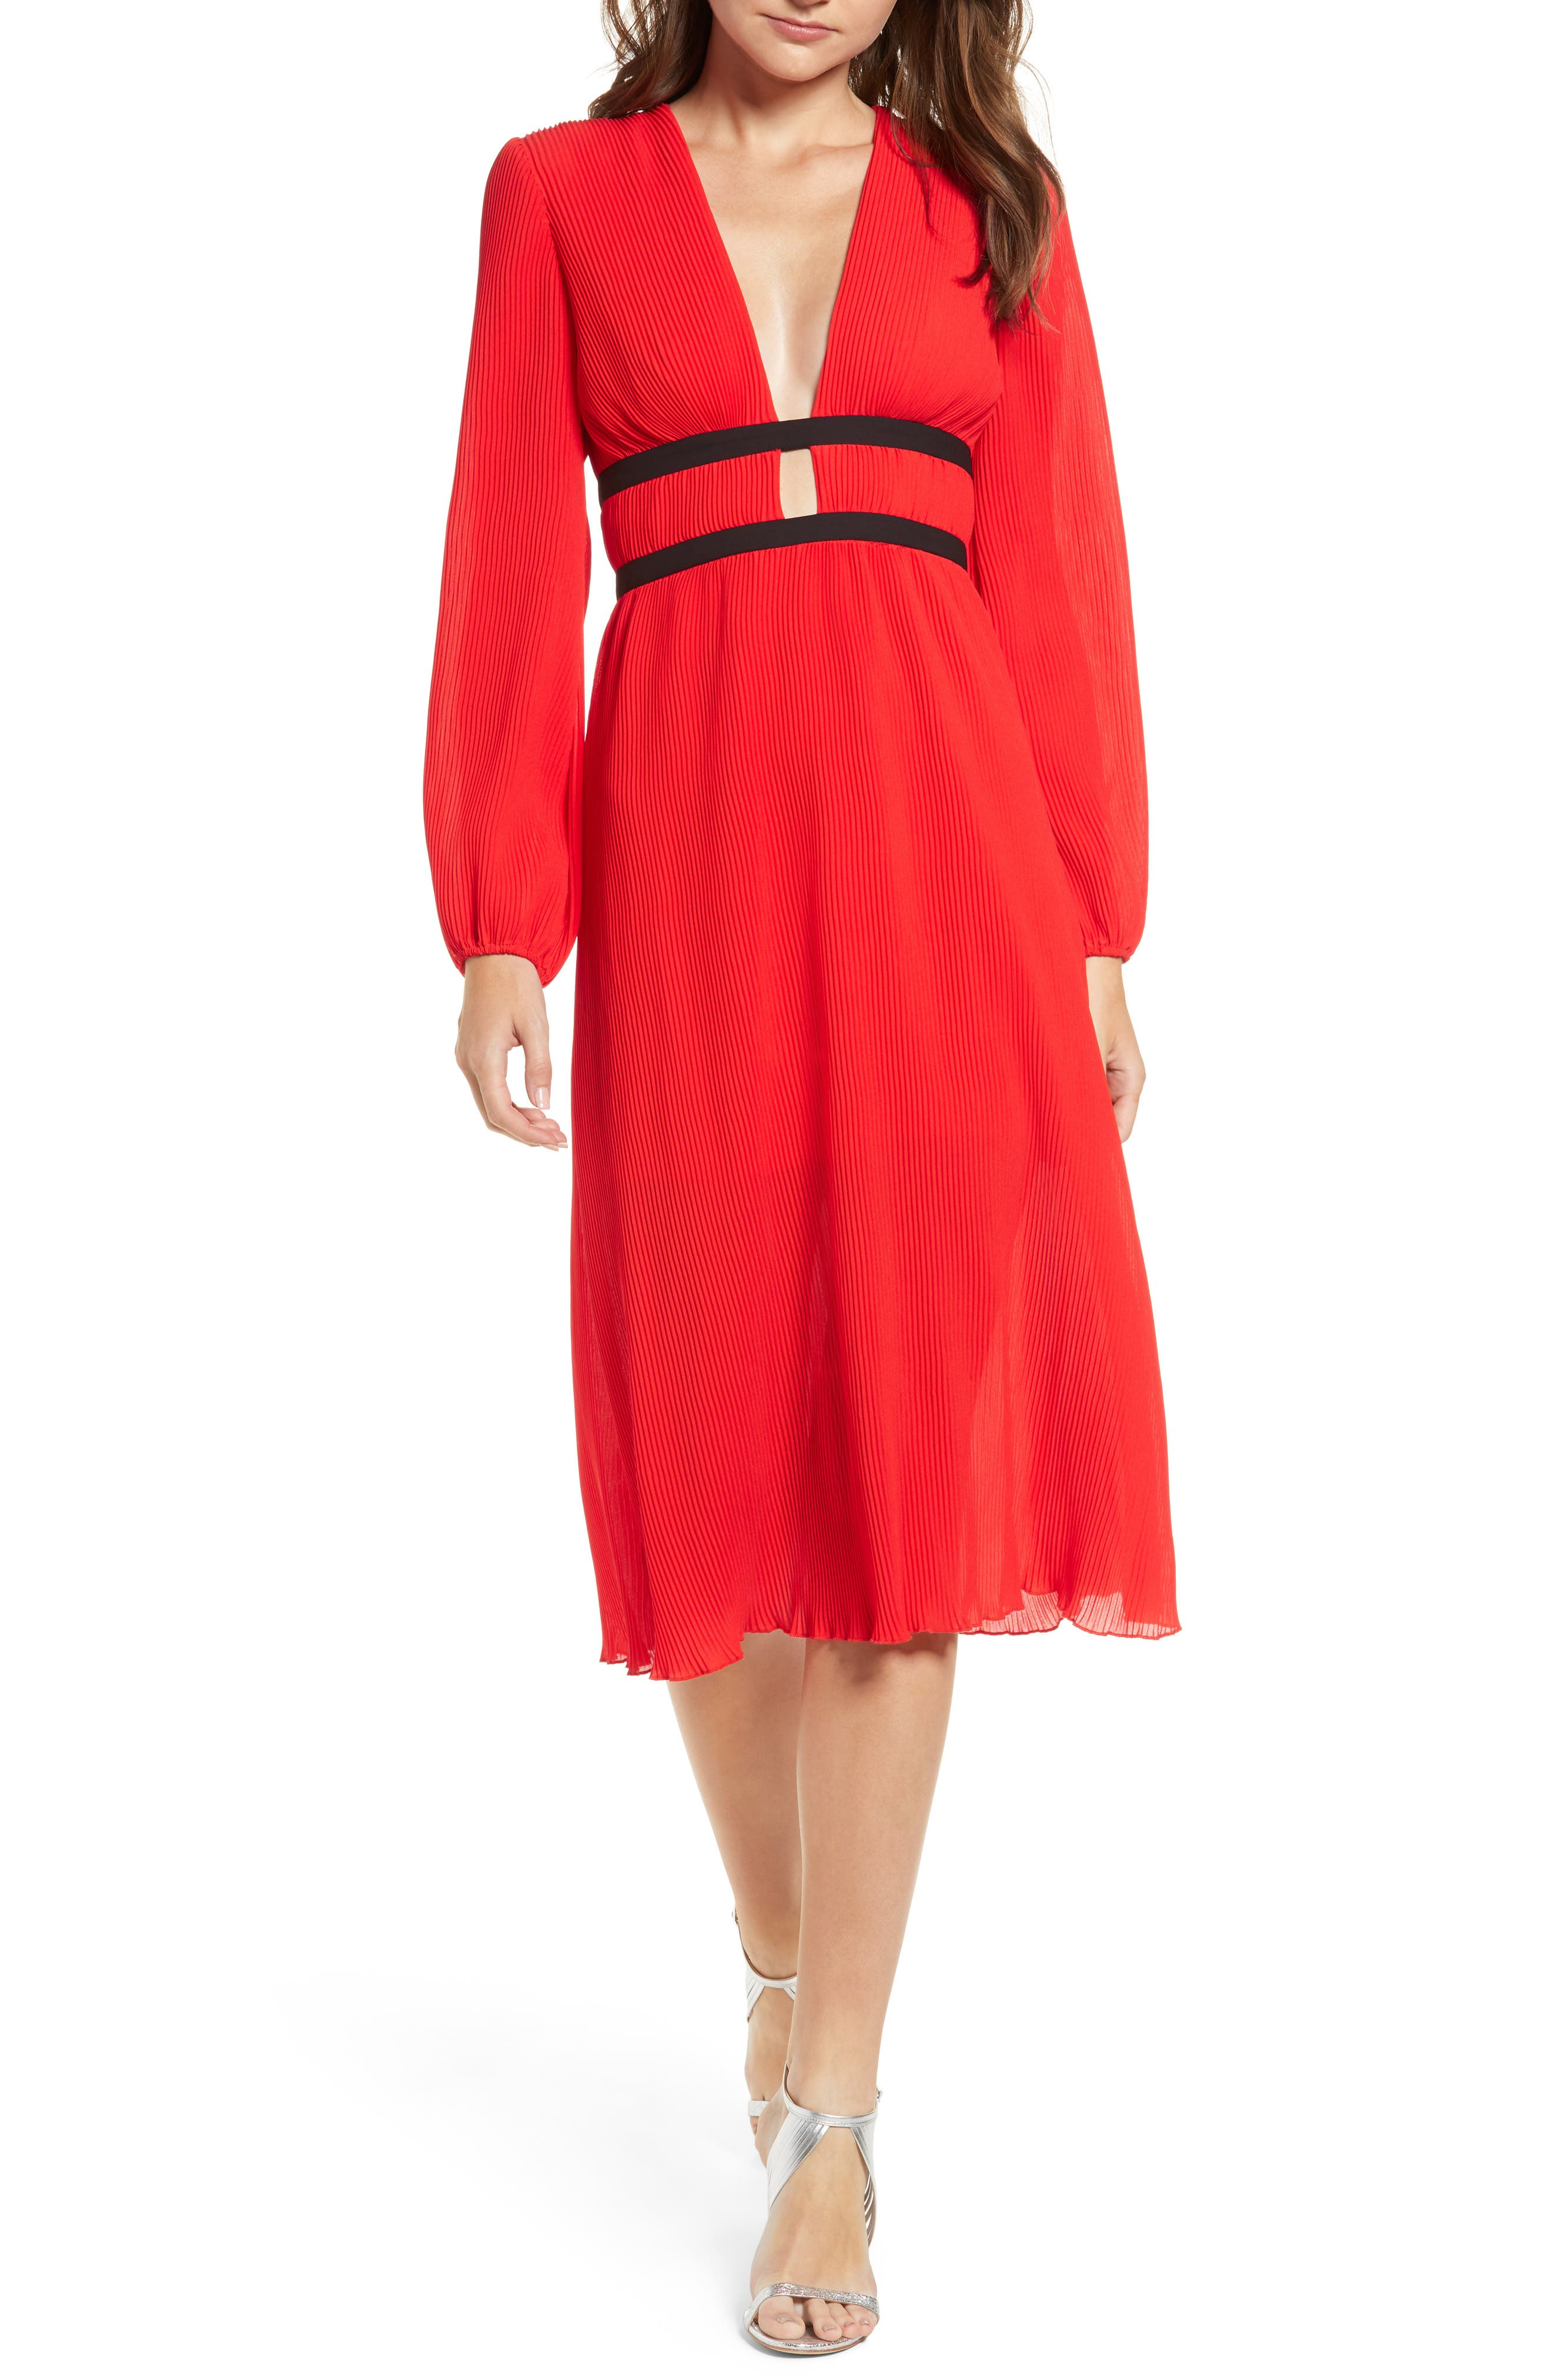 Wayf Patton Plunge Plisse Dress, Red